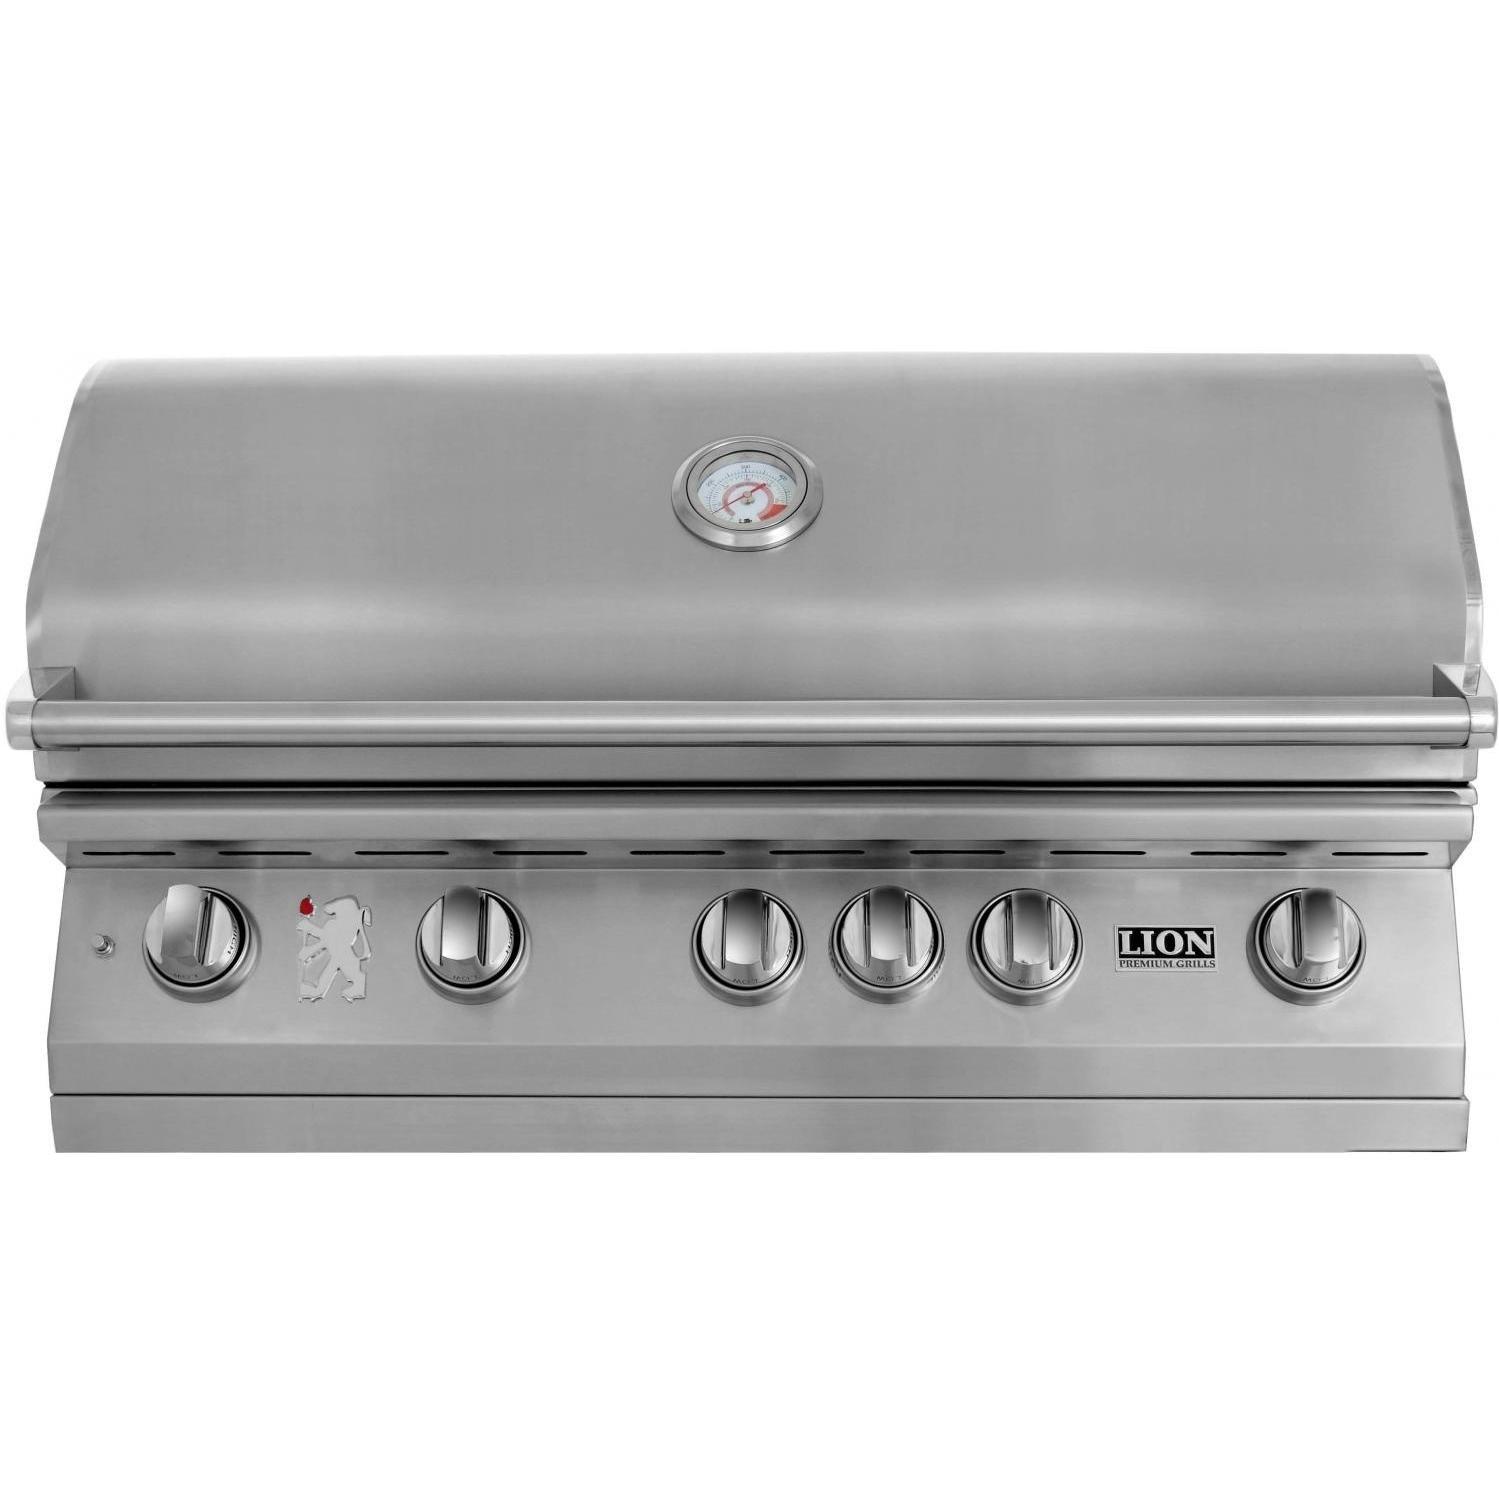 Lion Premium Grills 90814 40'' Propane Grill